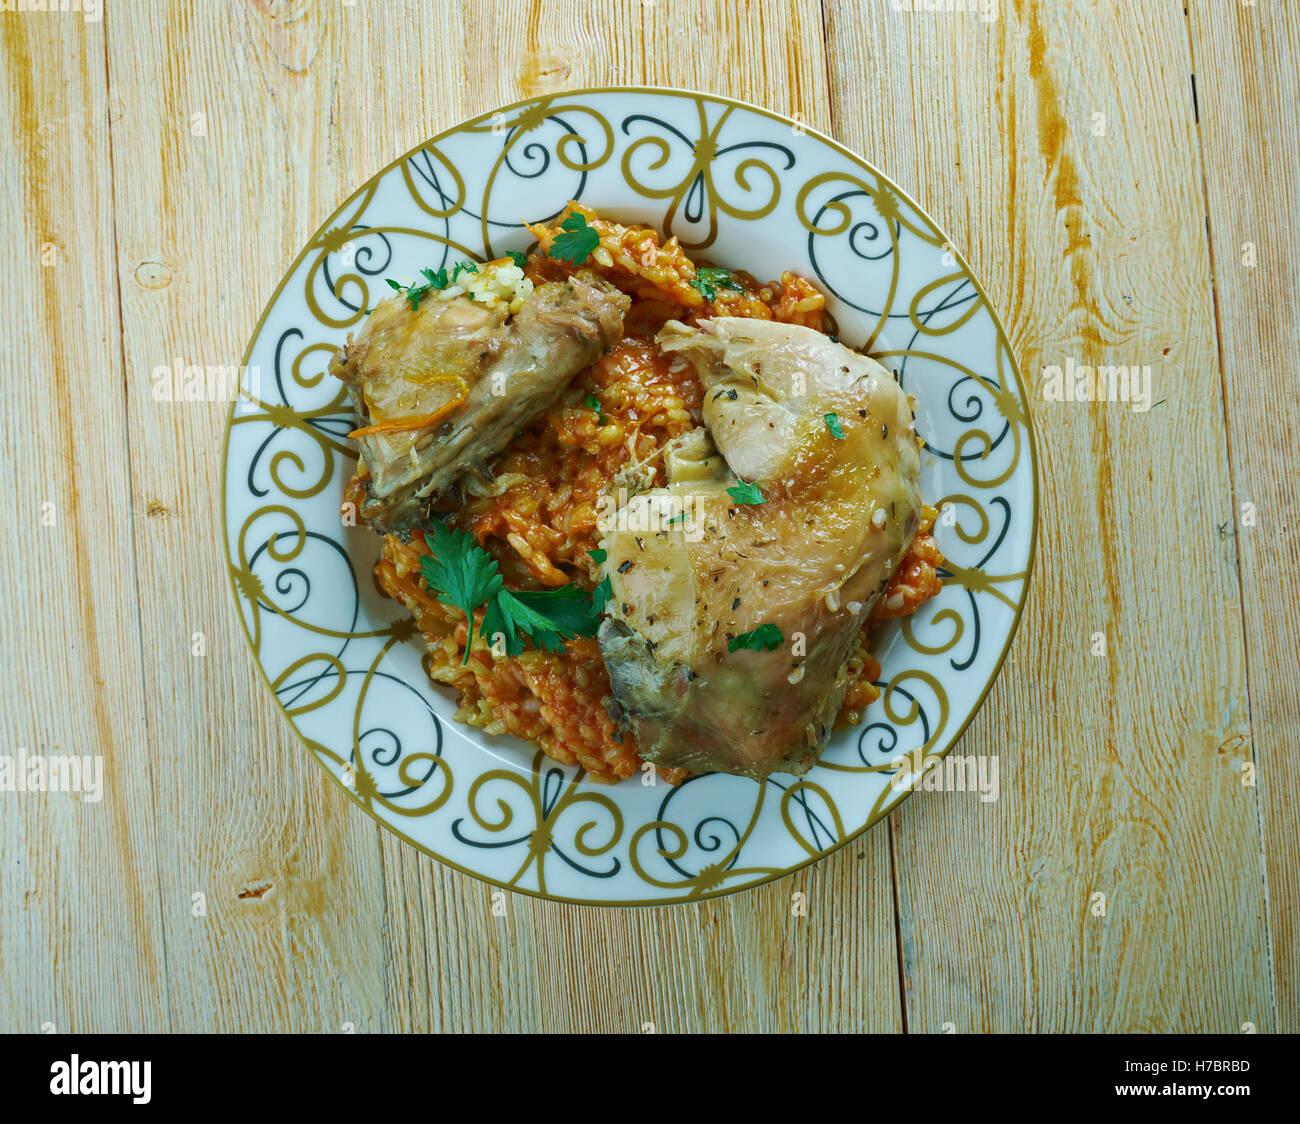 Poulet de Komoren. Komoren Huhn - Küche Komoren Stockfoto, Bild ...